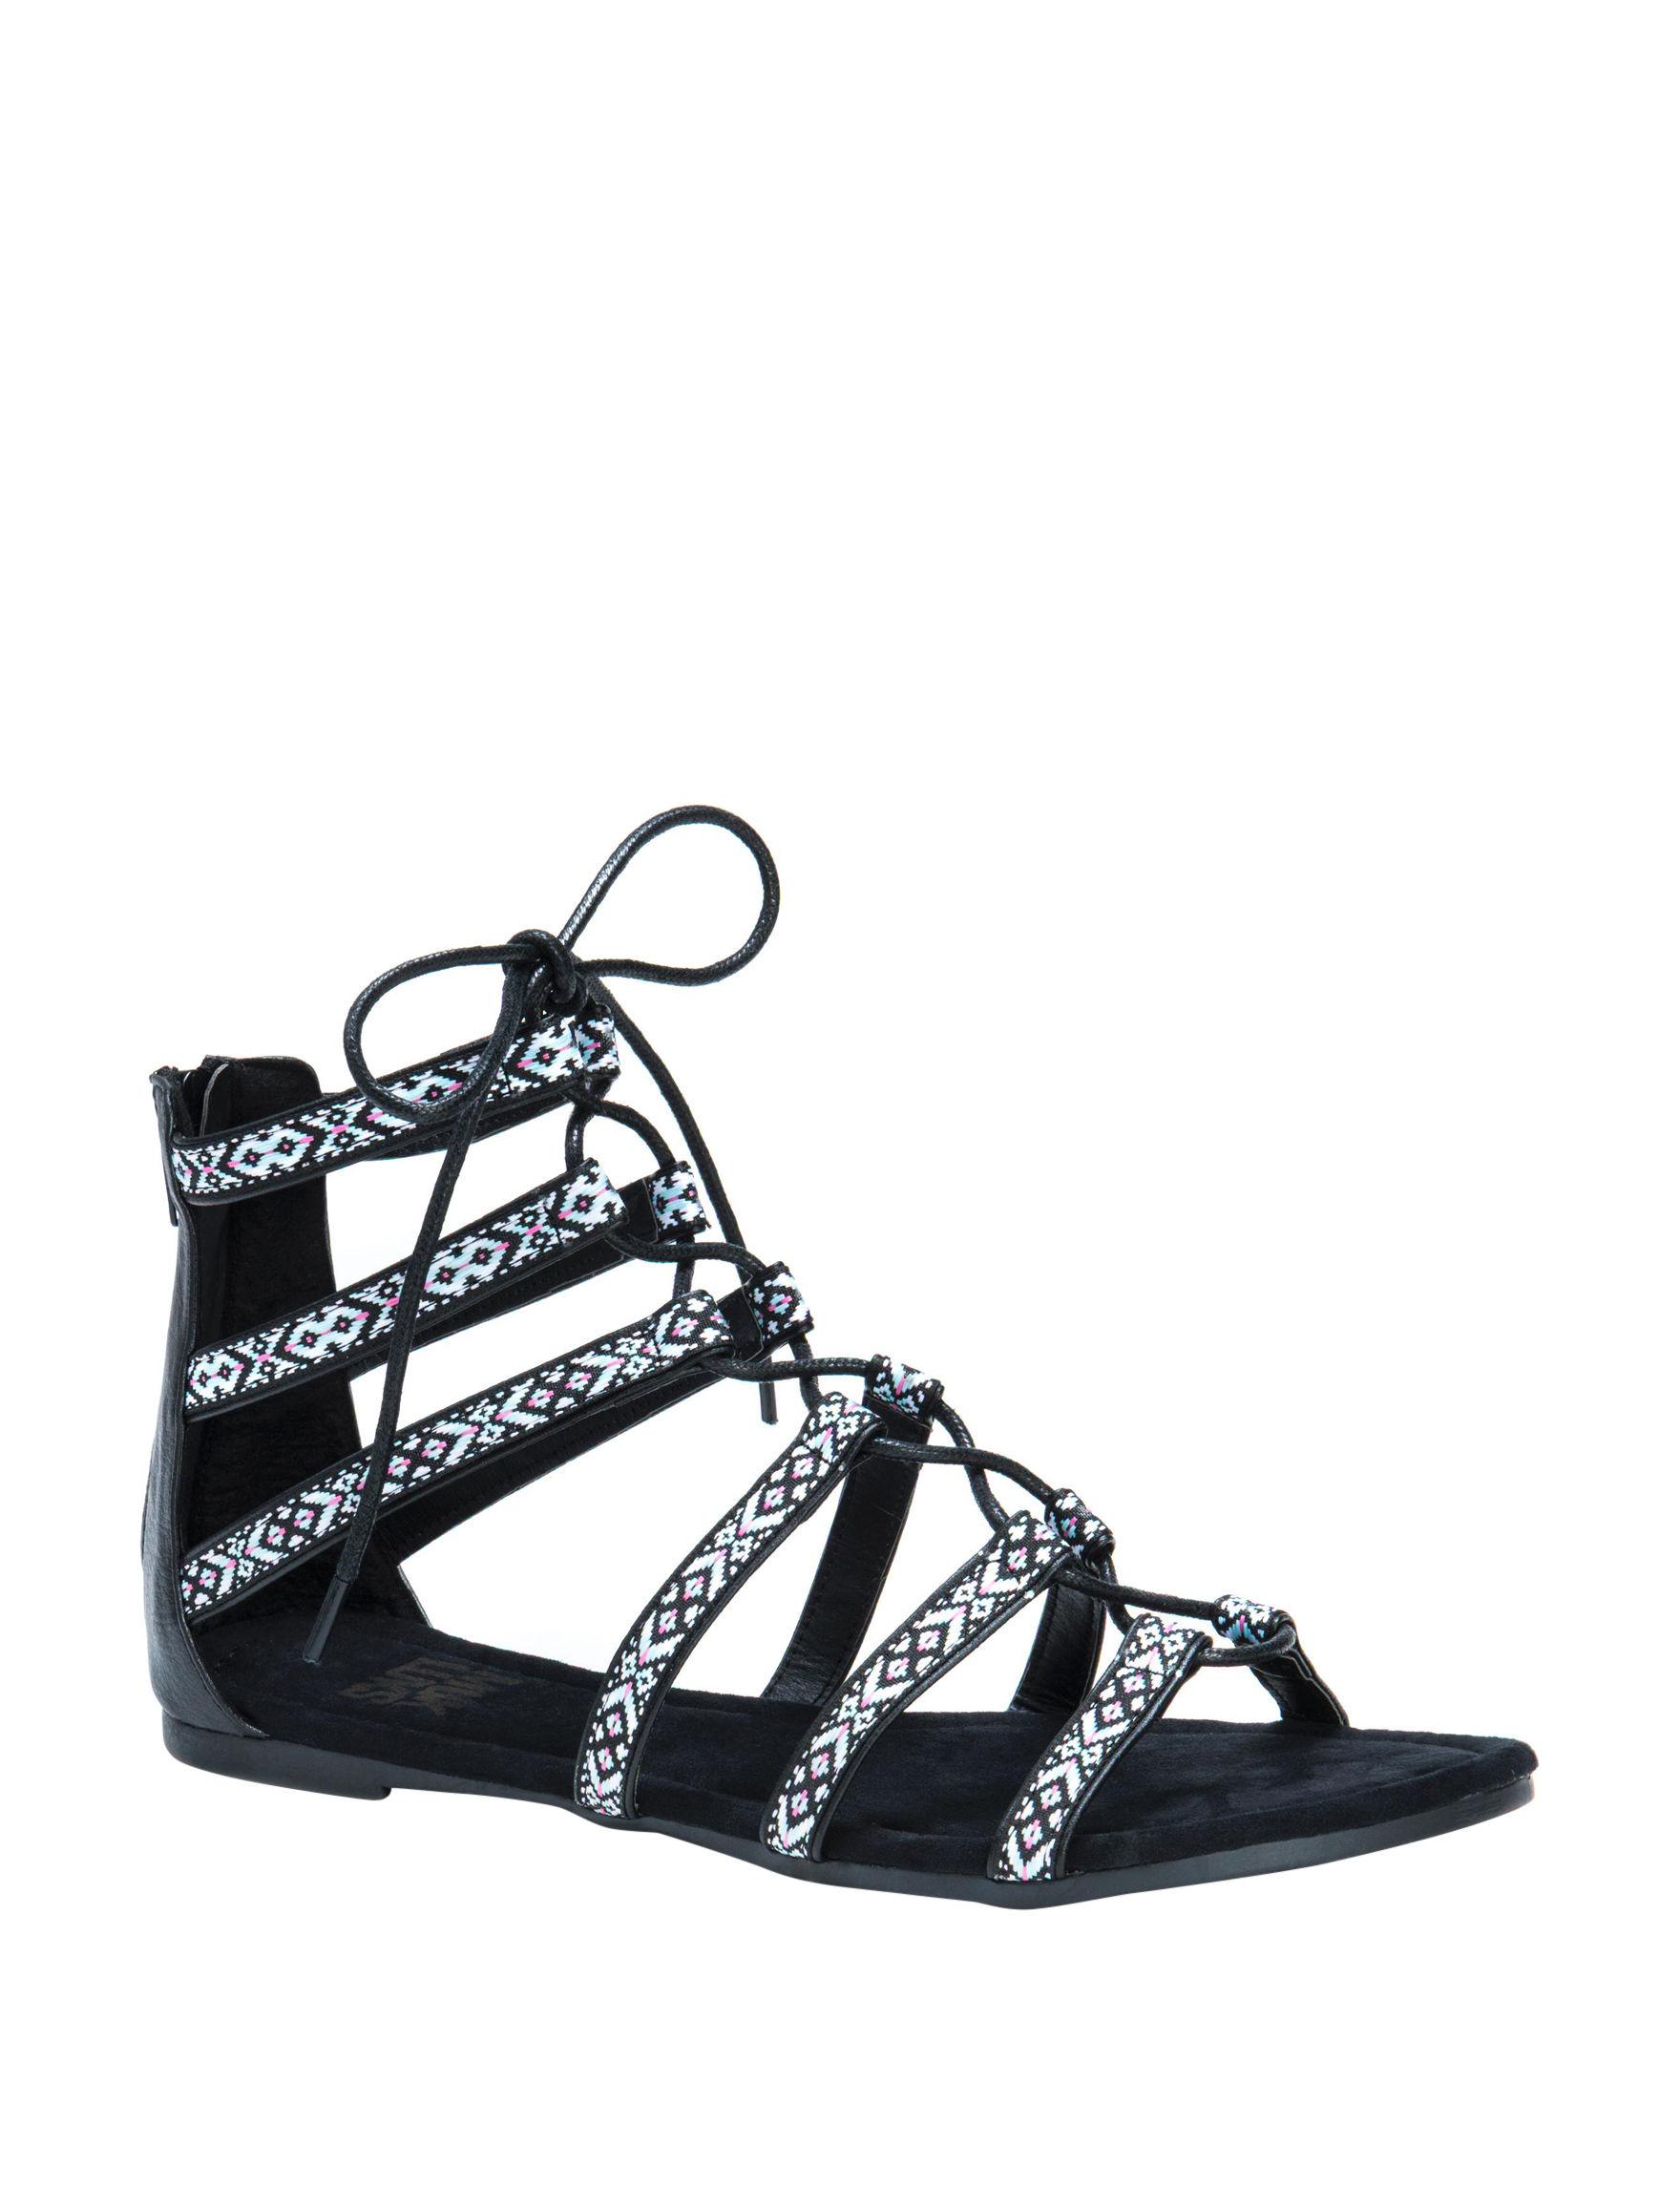 Muk Luks Black Flat Sandals Gladiators